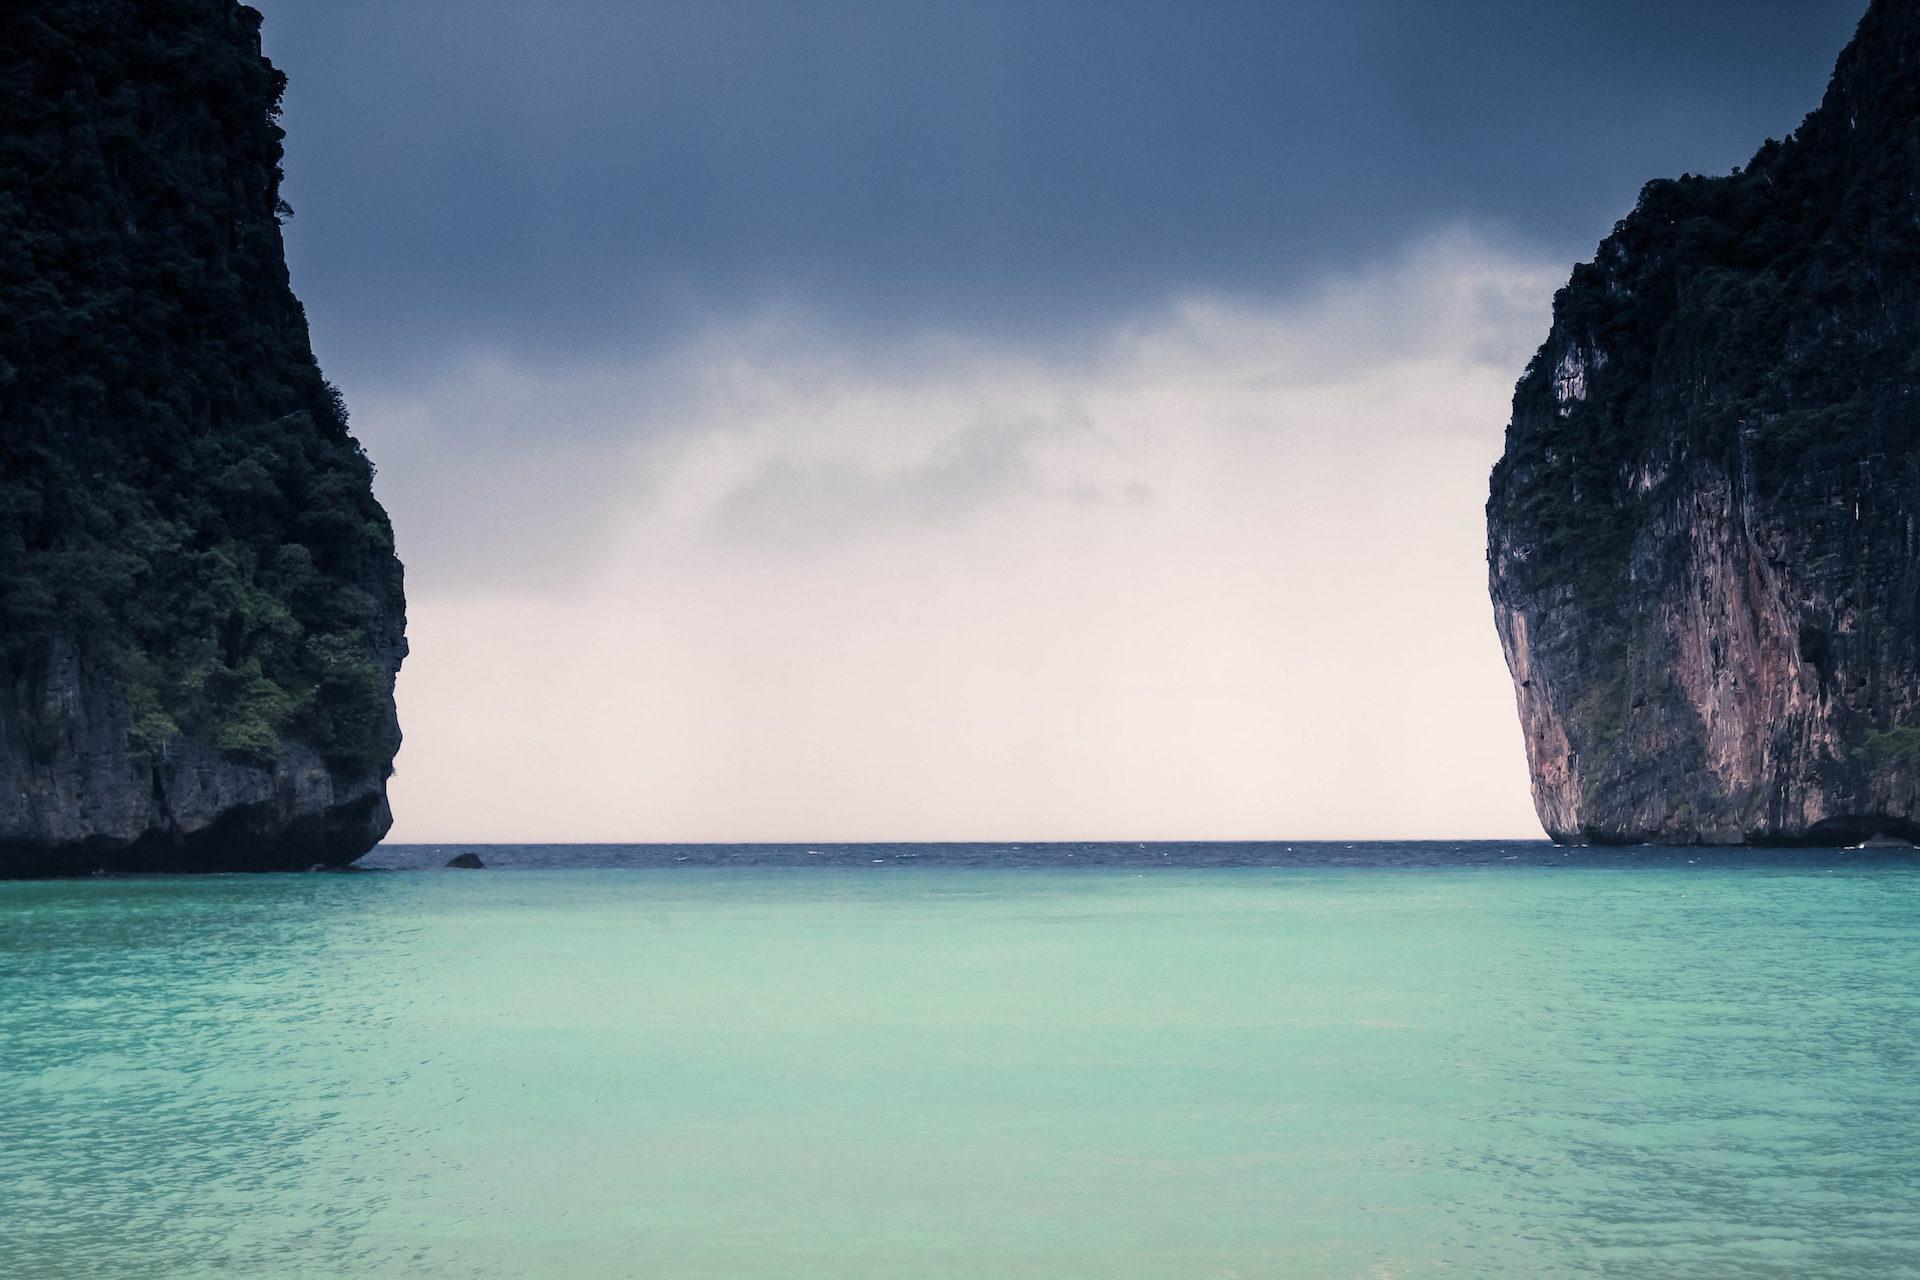 Strand, Montañas, Meer, Amplitude, Entfernung - Wallpaper HD - Prof.-falken.com